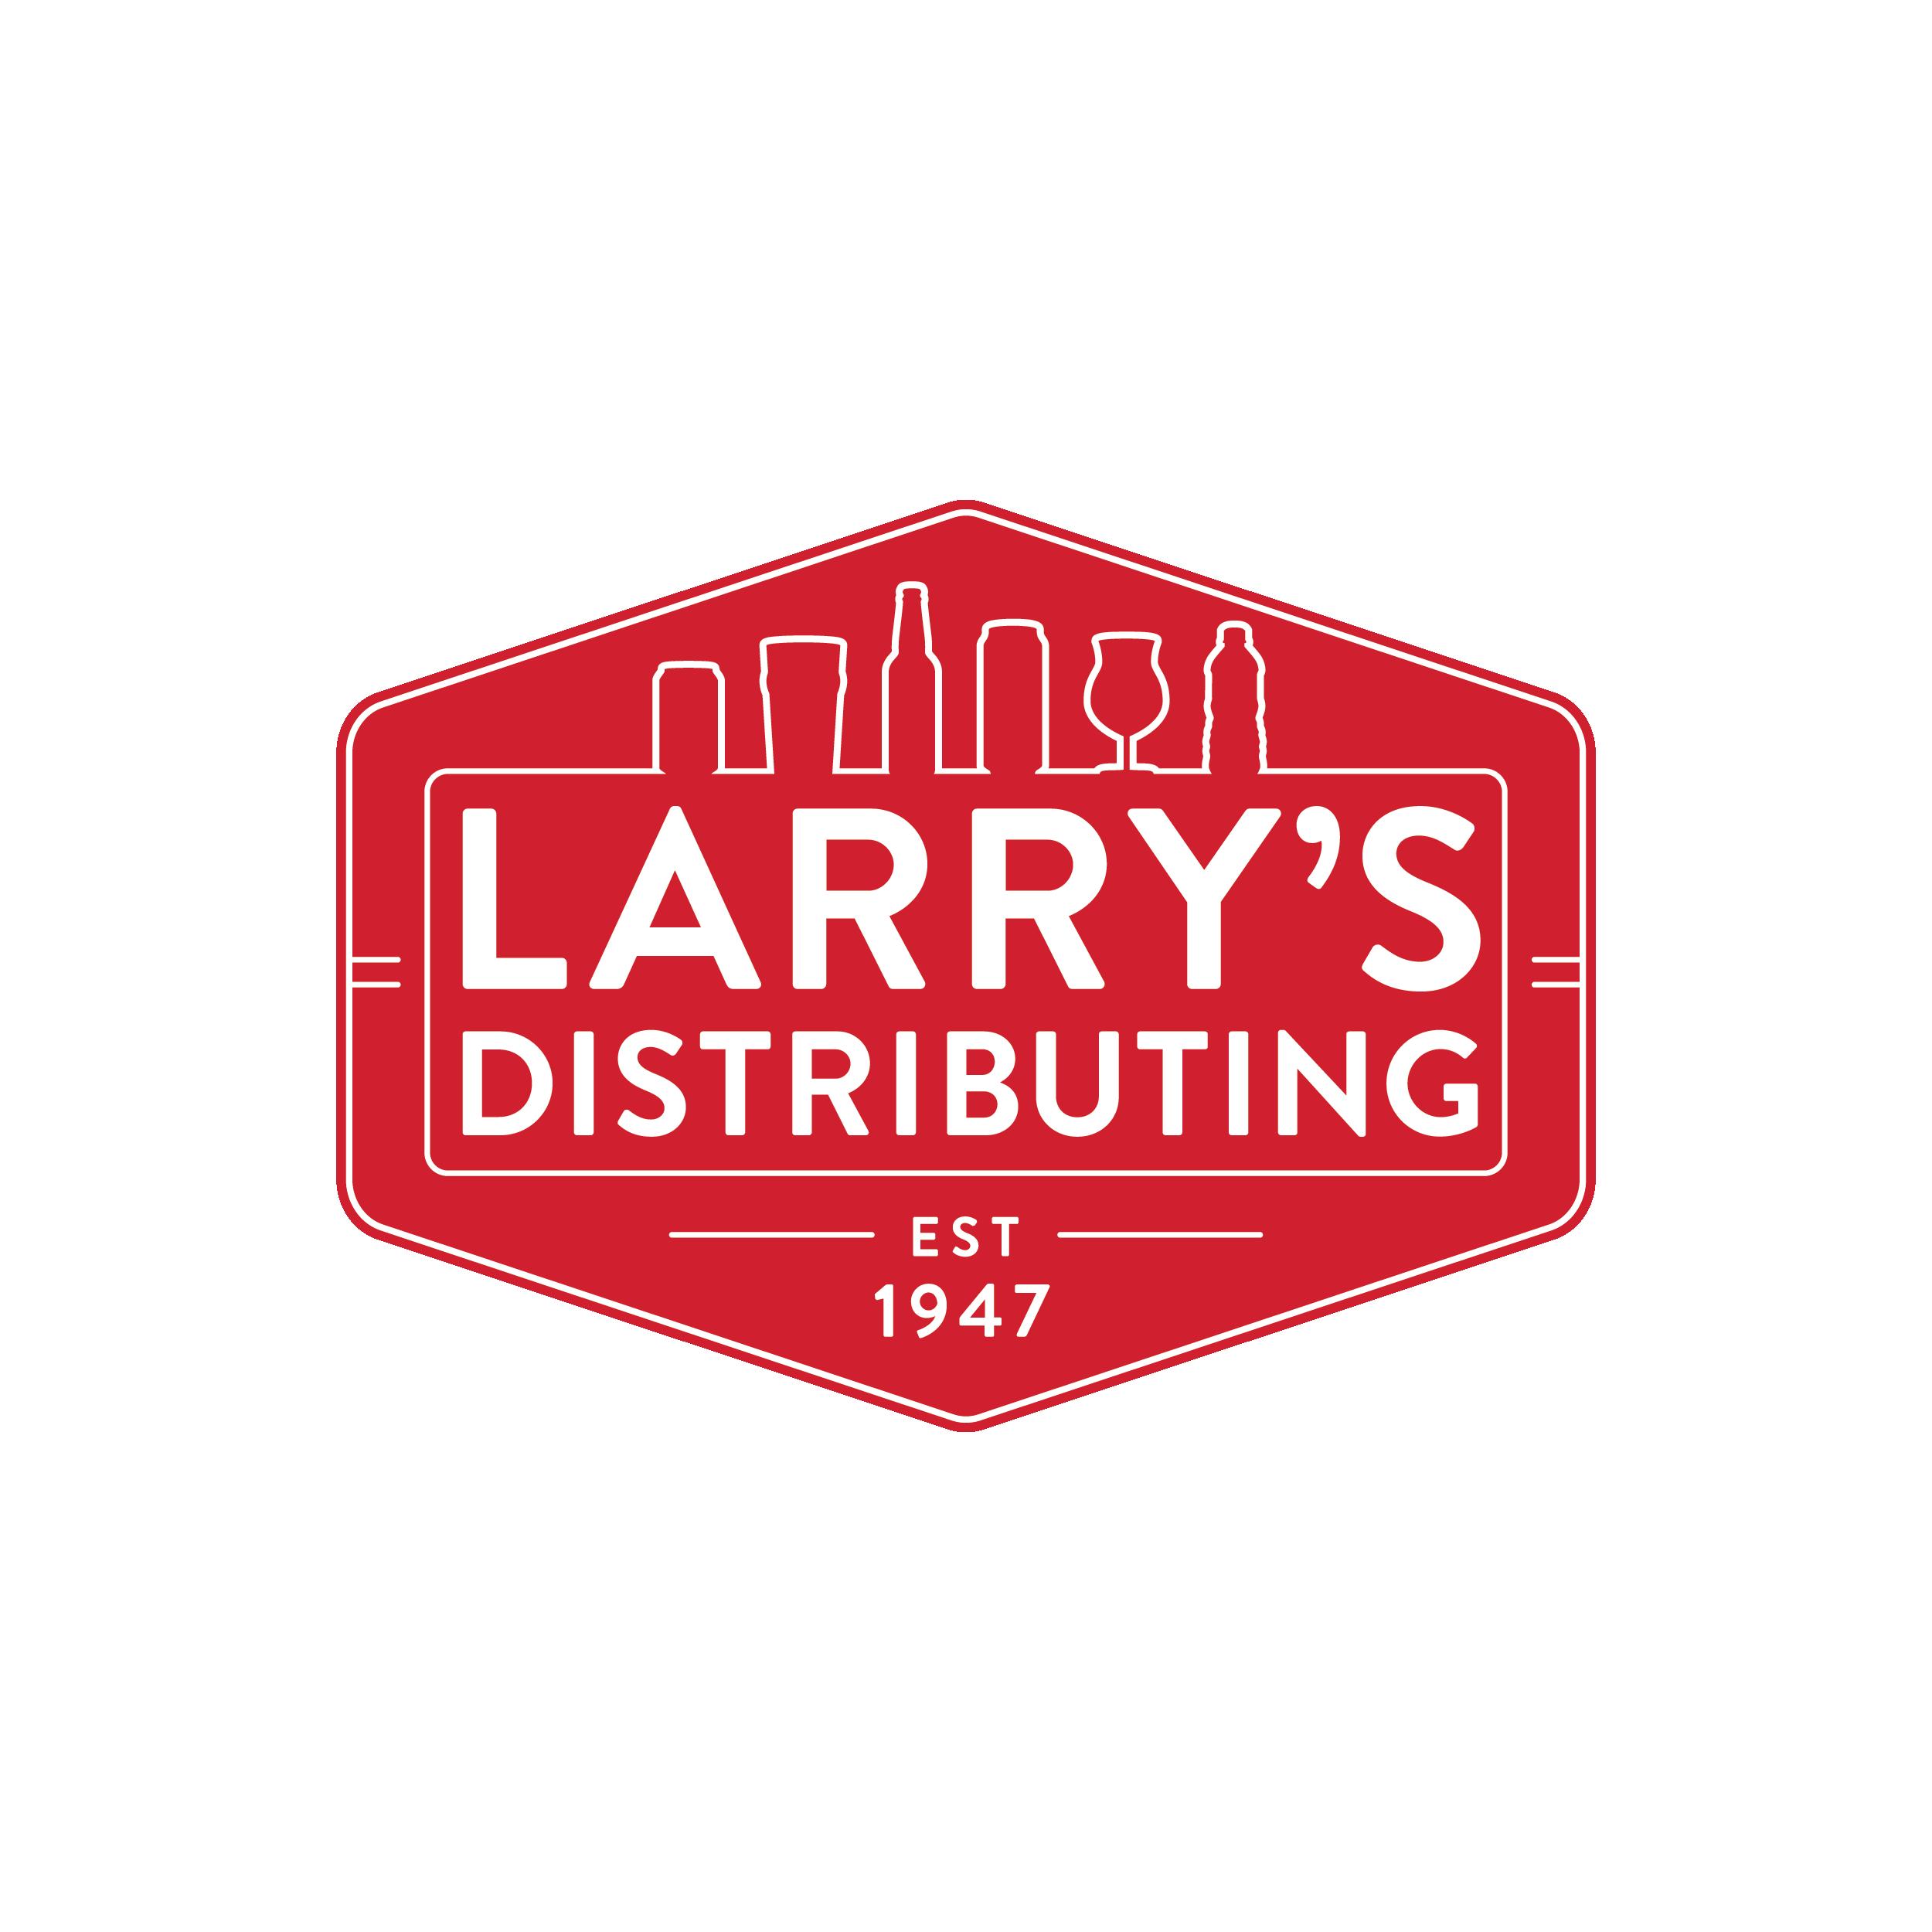 Larry's Distributing